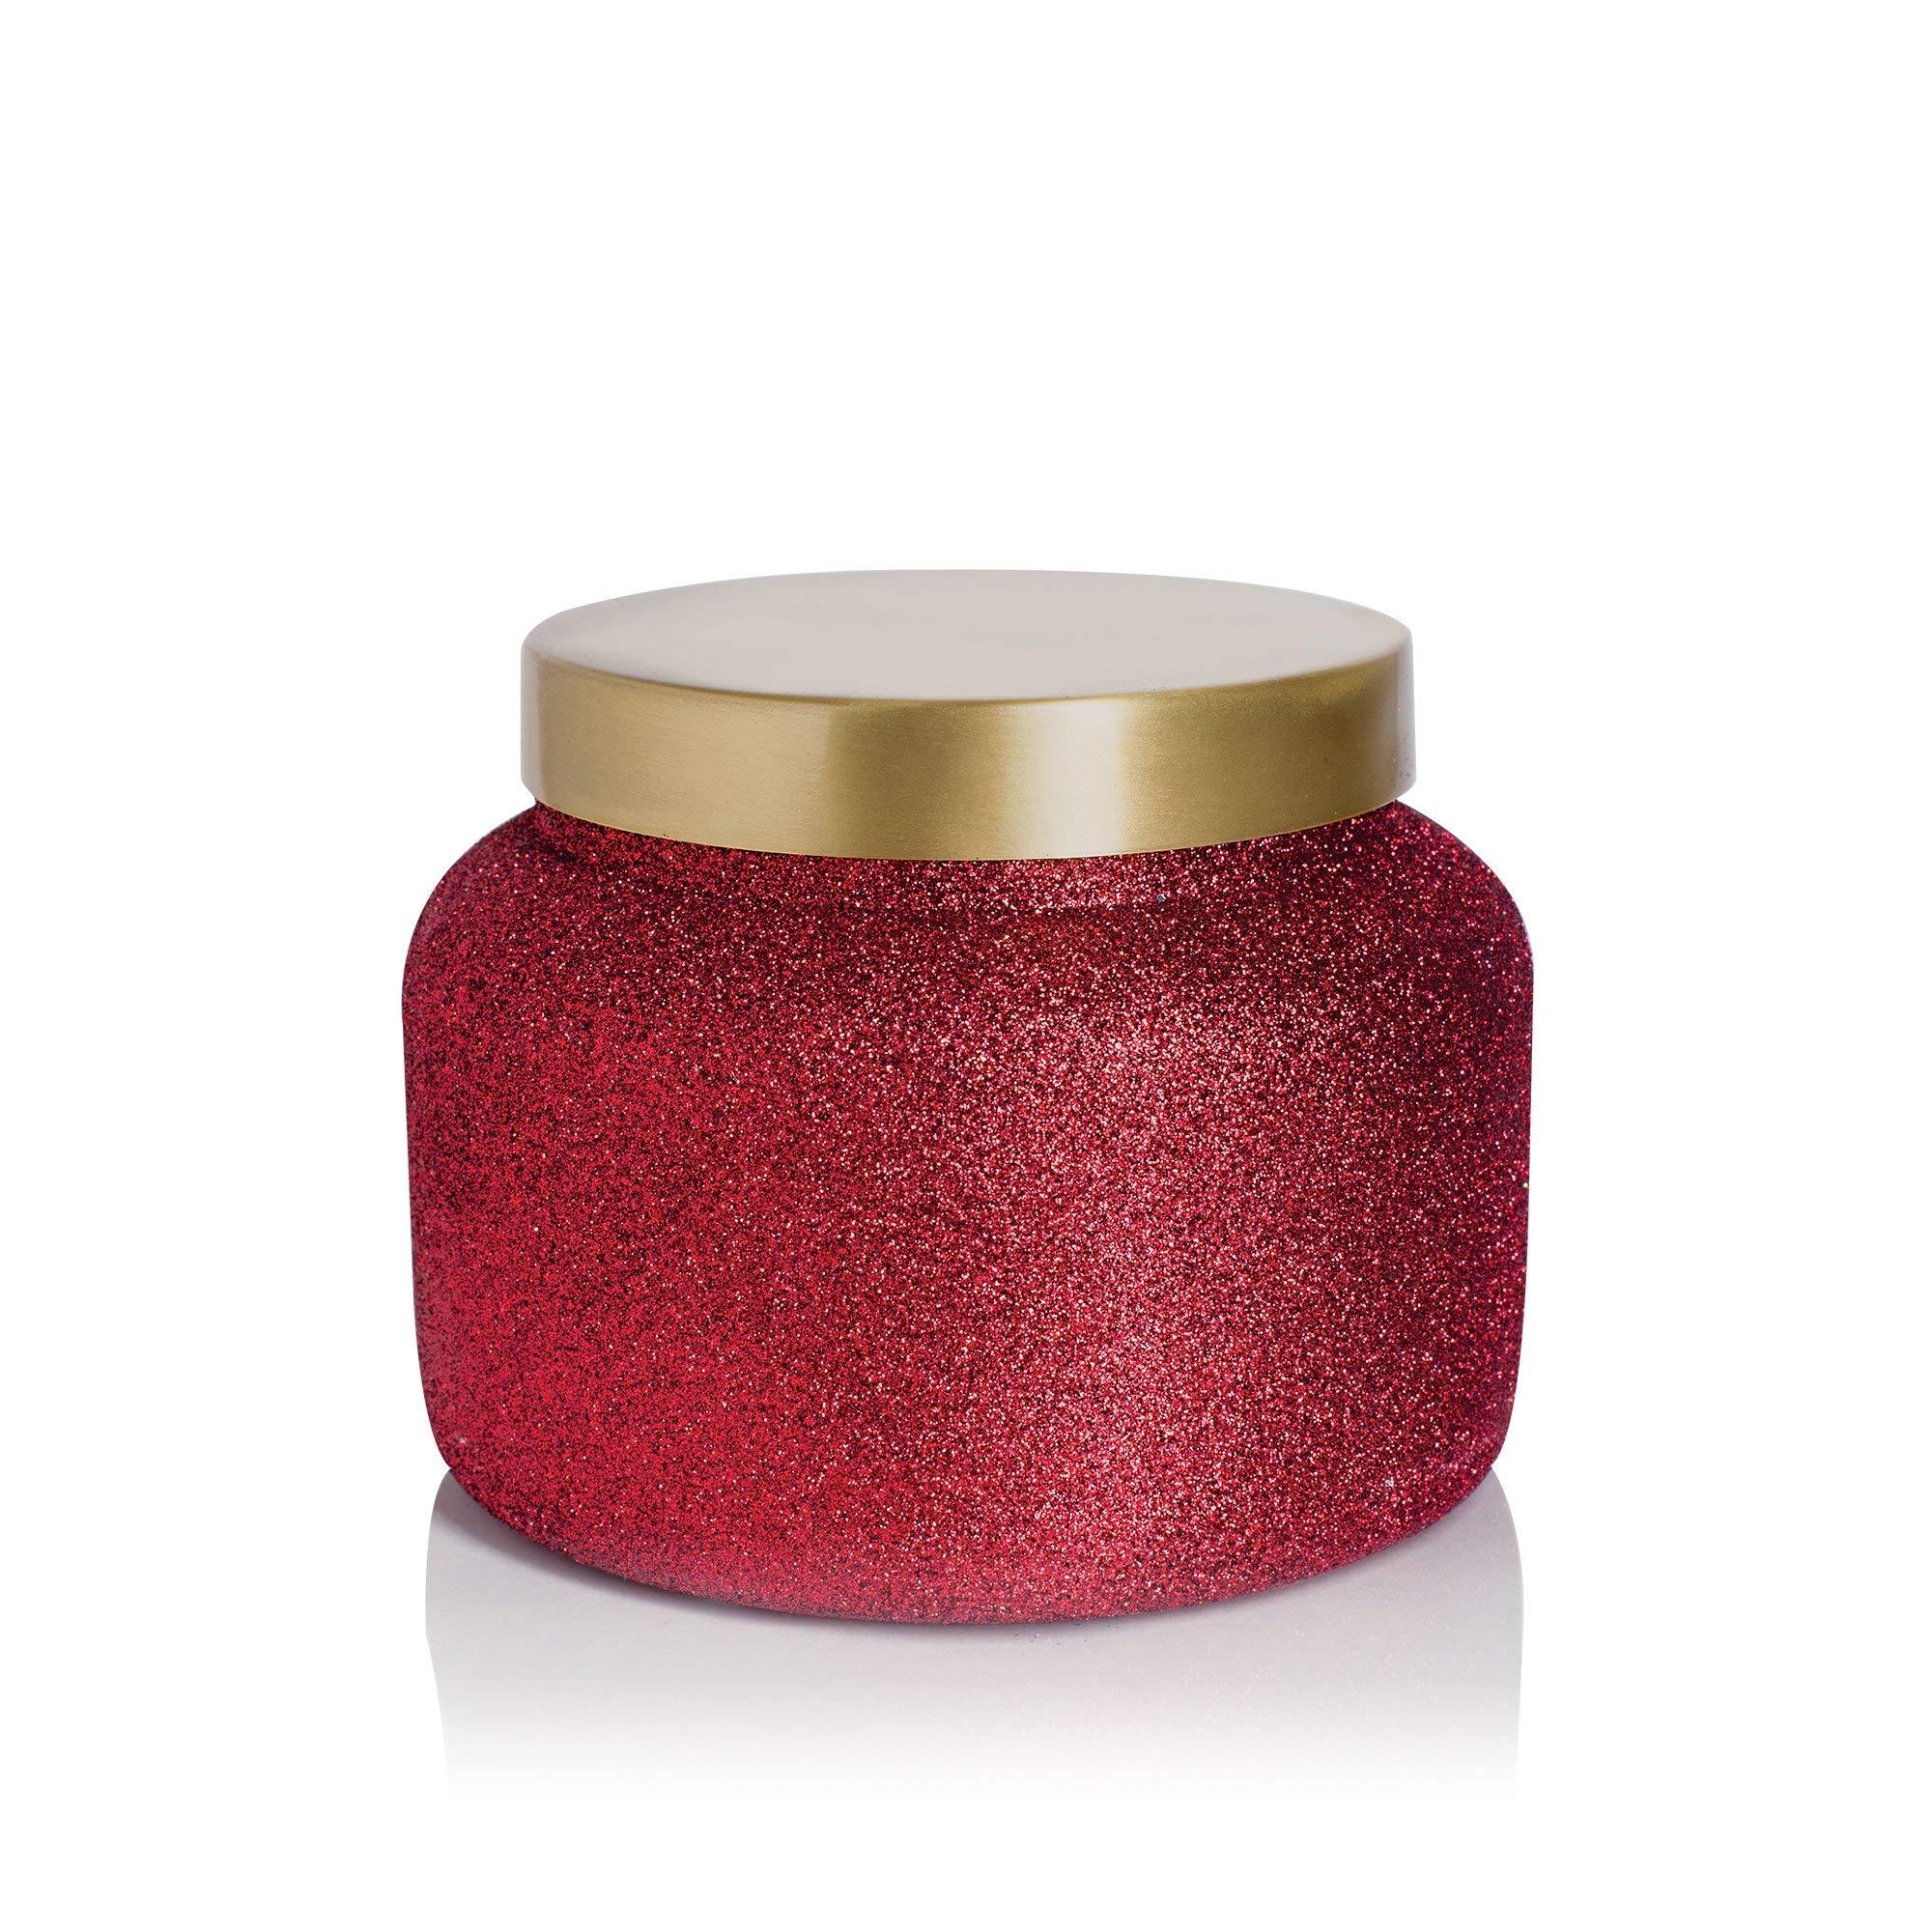 Capri Blue Glitter Glam Jumbo 48 oz Jar Candle-Volcano